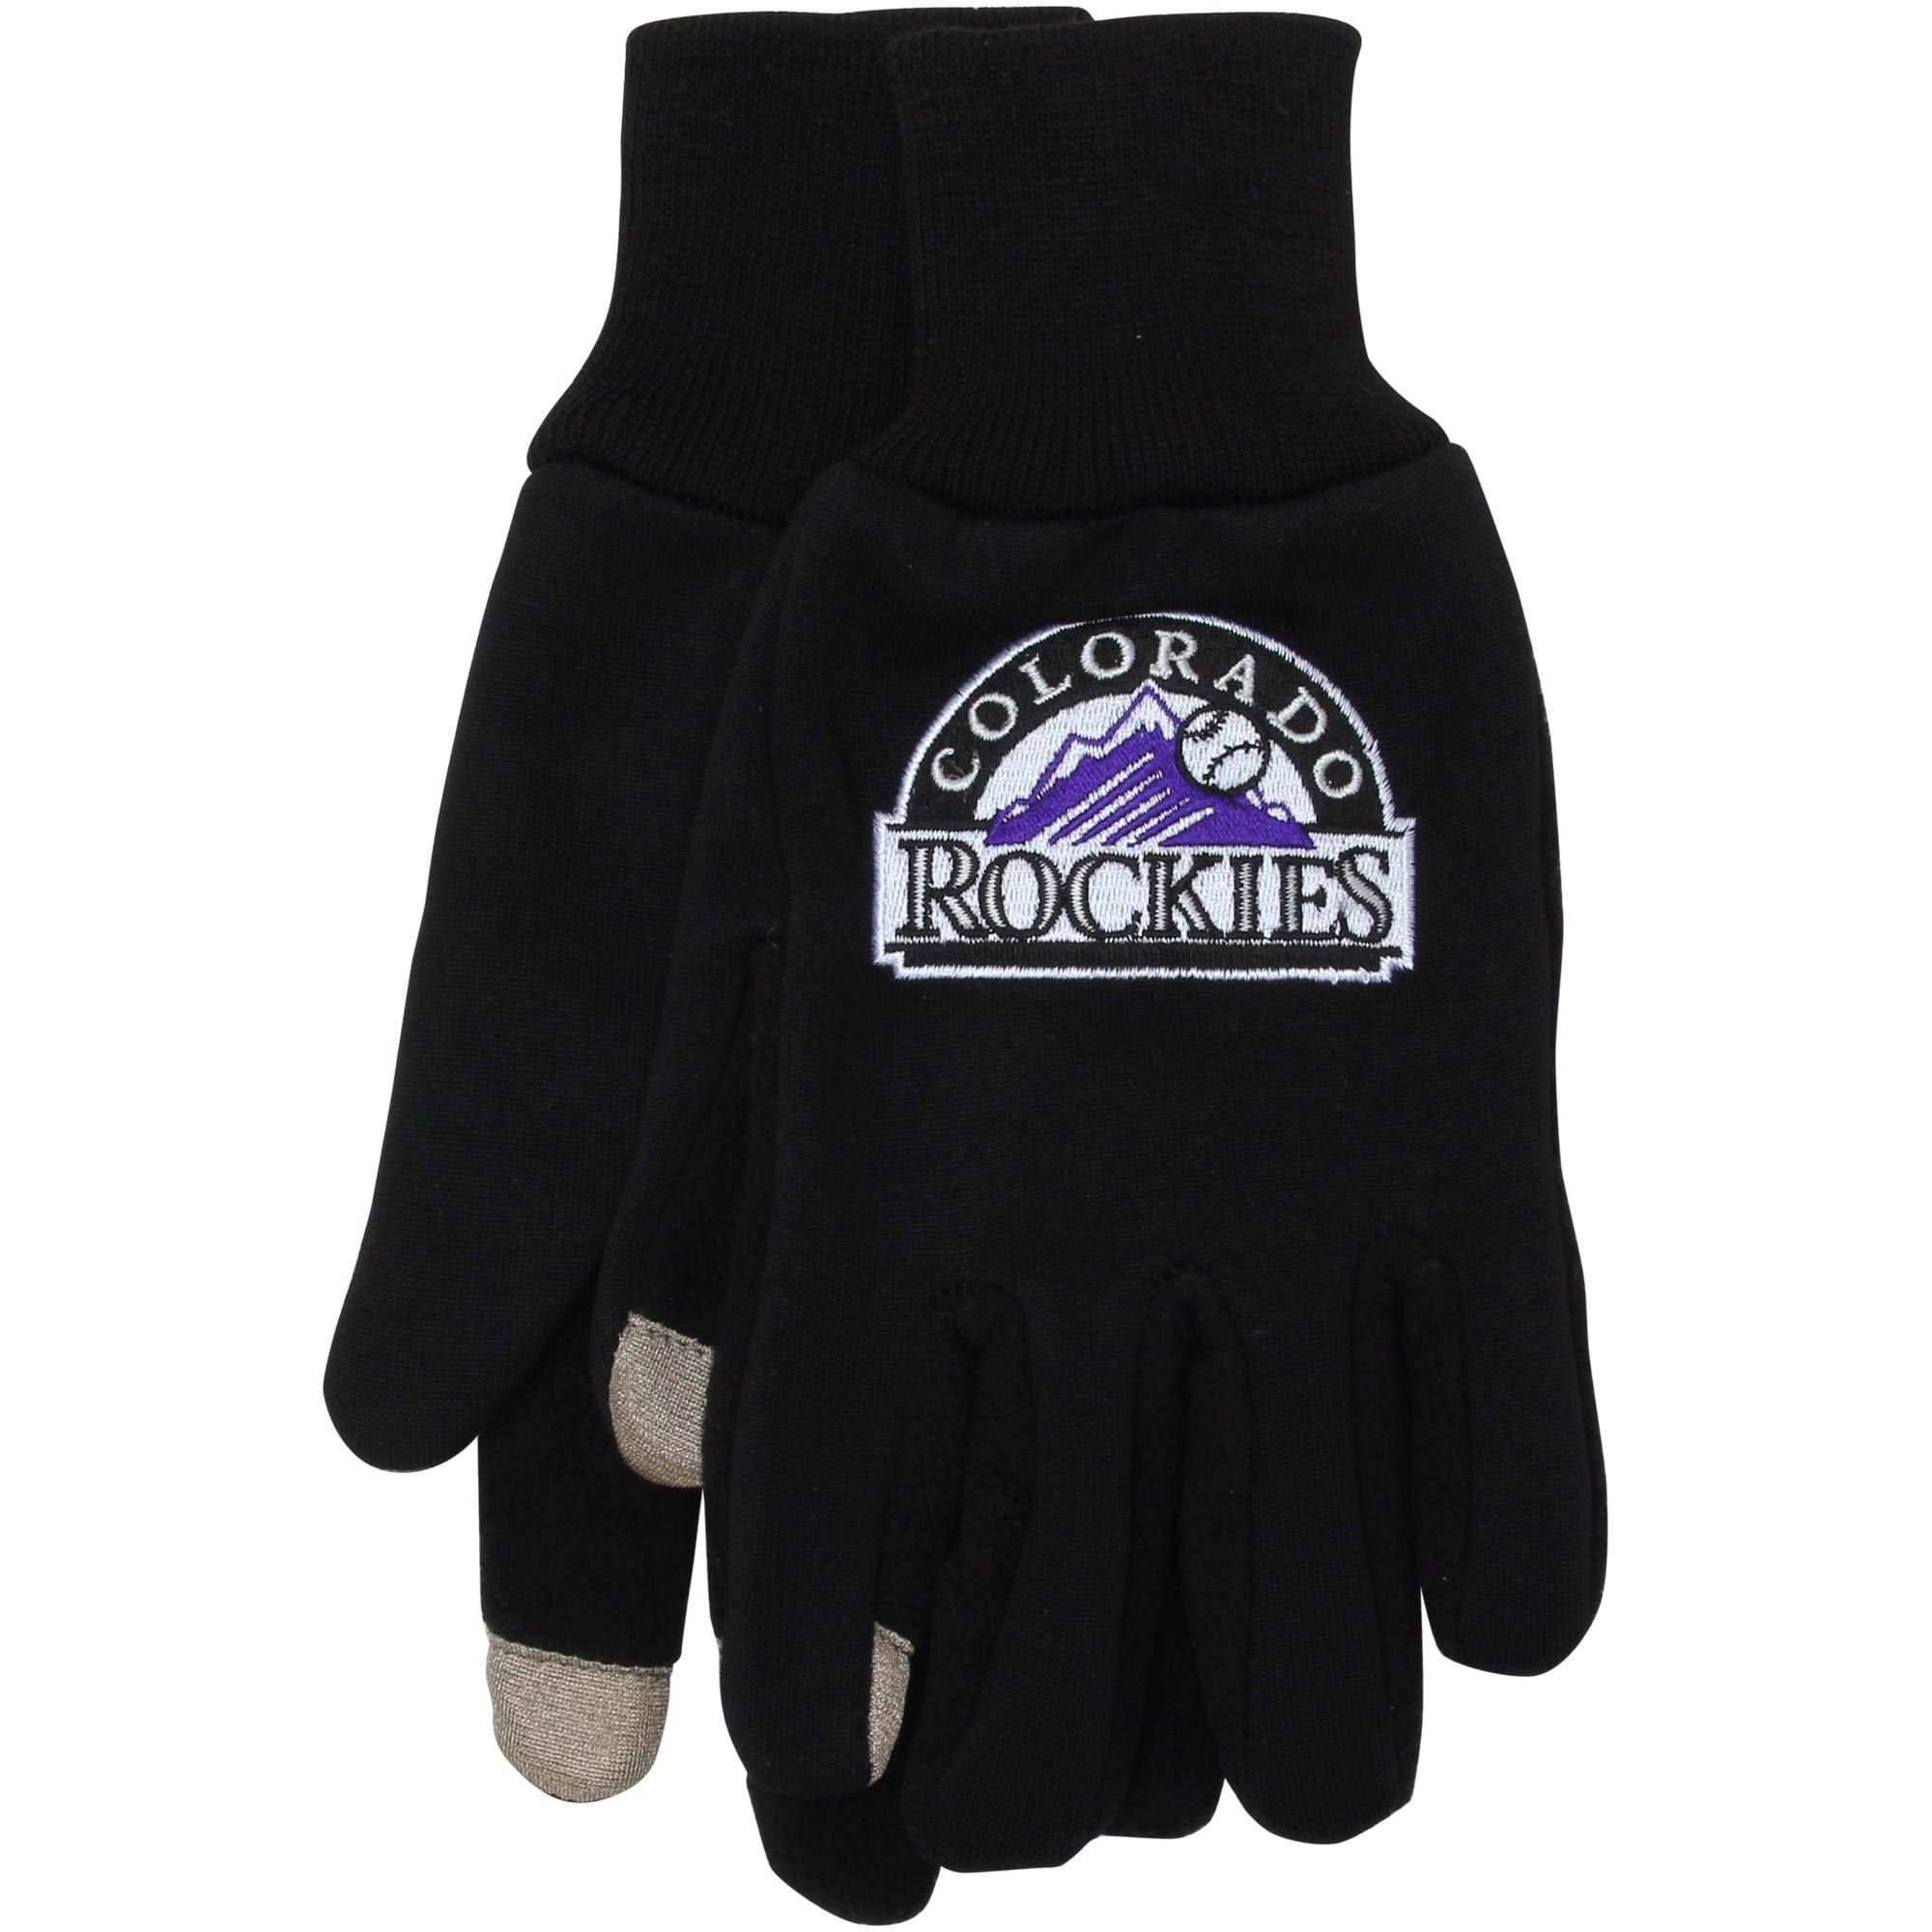 Colorado Rockies McArthur Team Logo Touch Gloves - Black